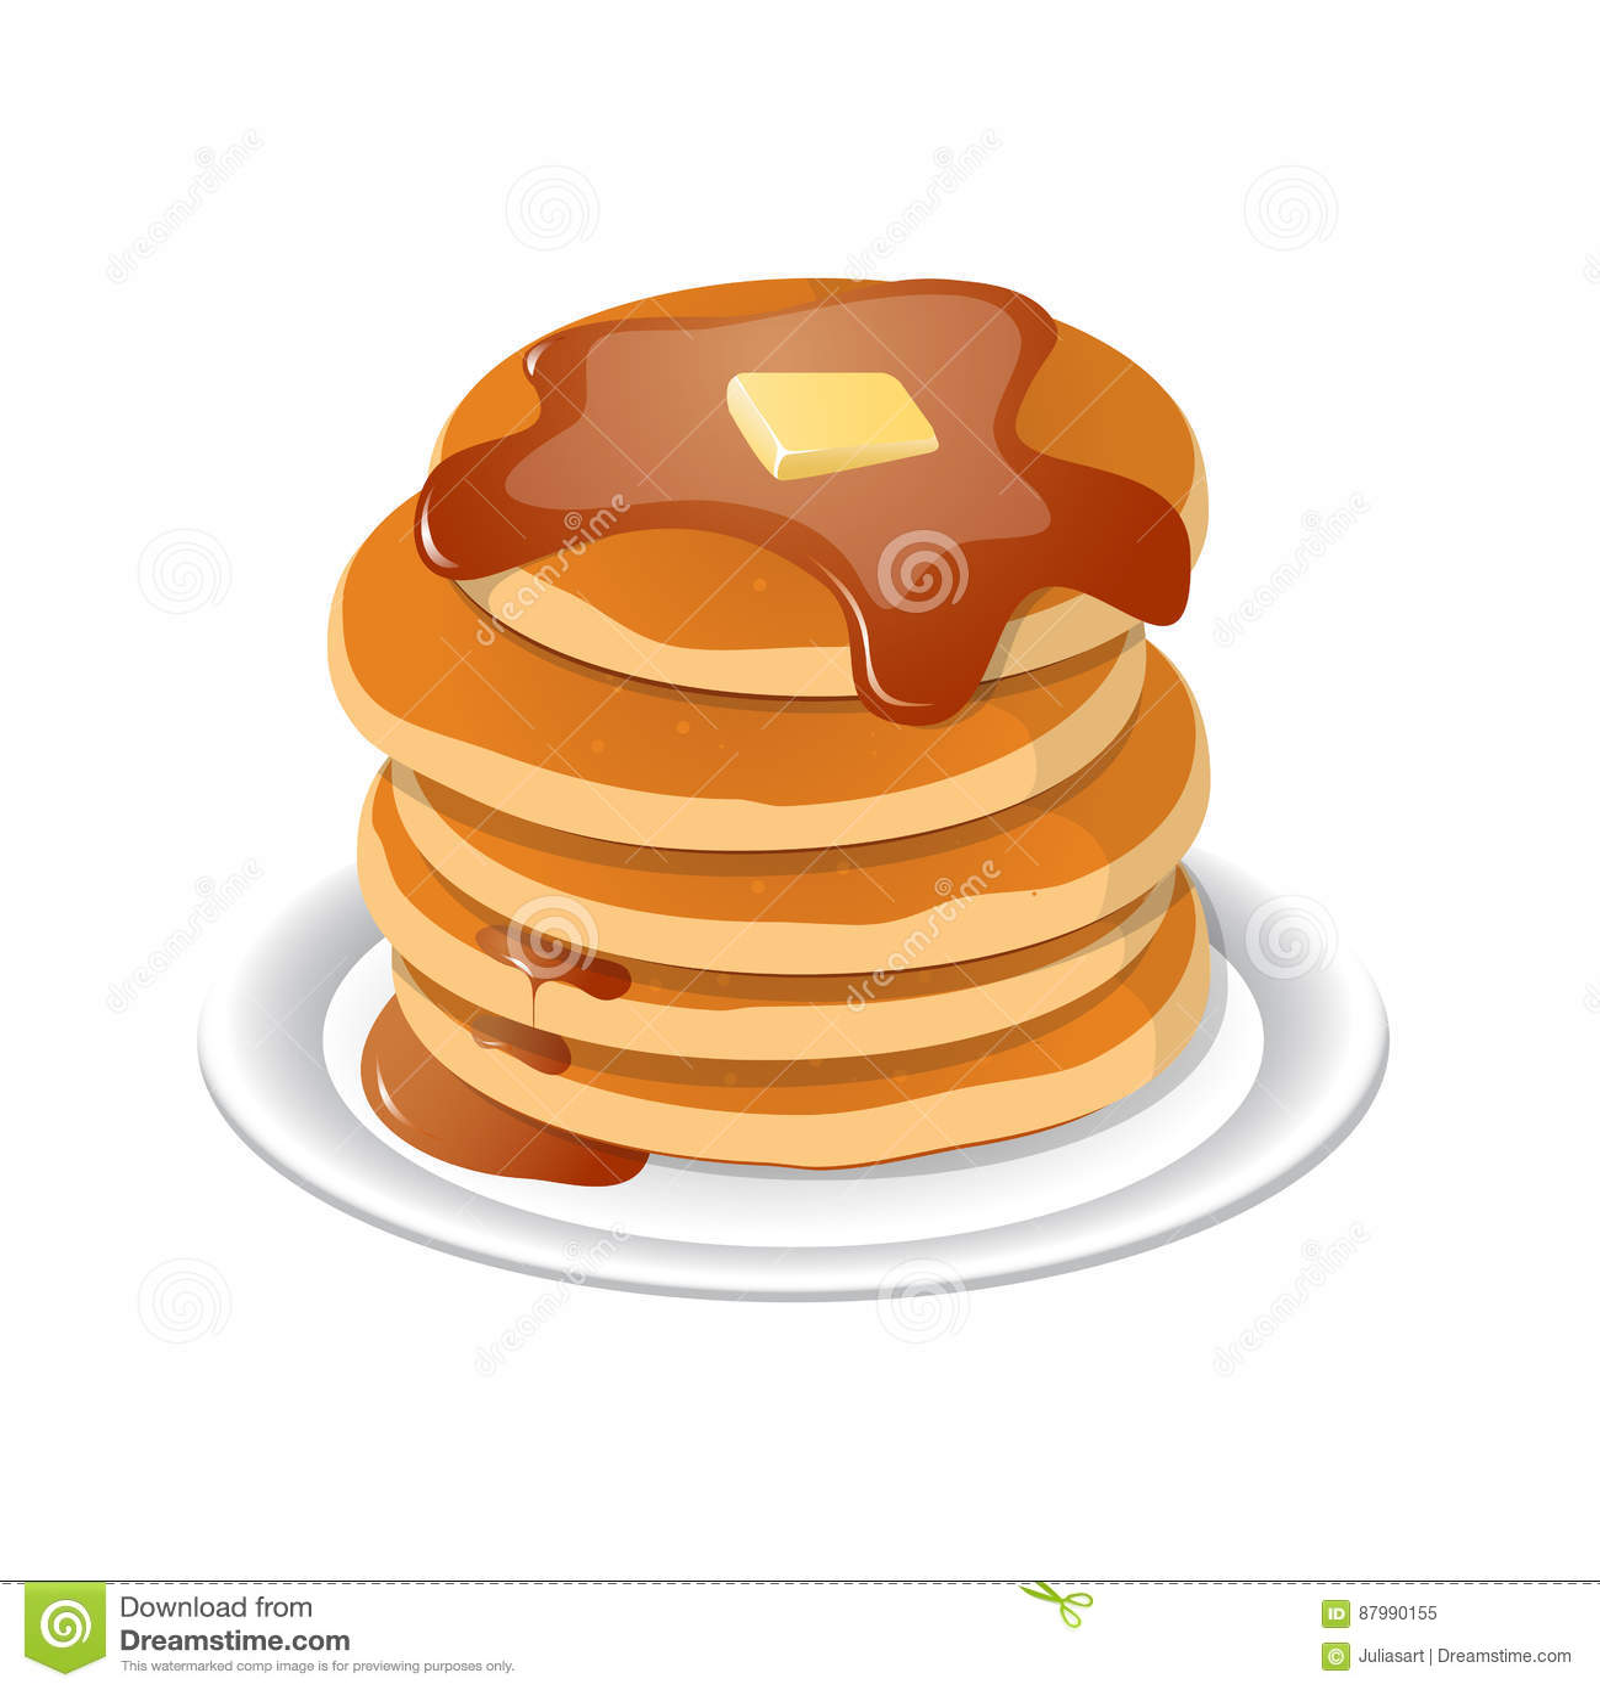 Fresh Tasty Hot Pancakes With Sweet Maple Syrup Cartoon